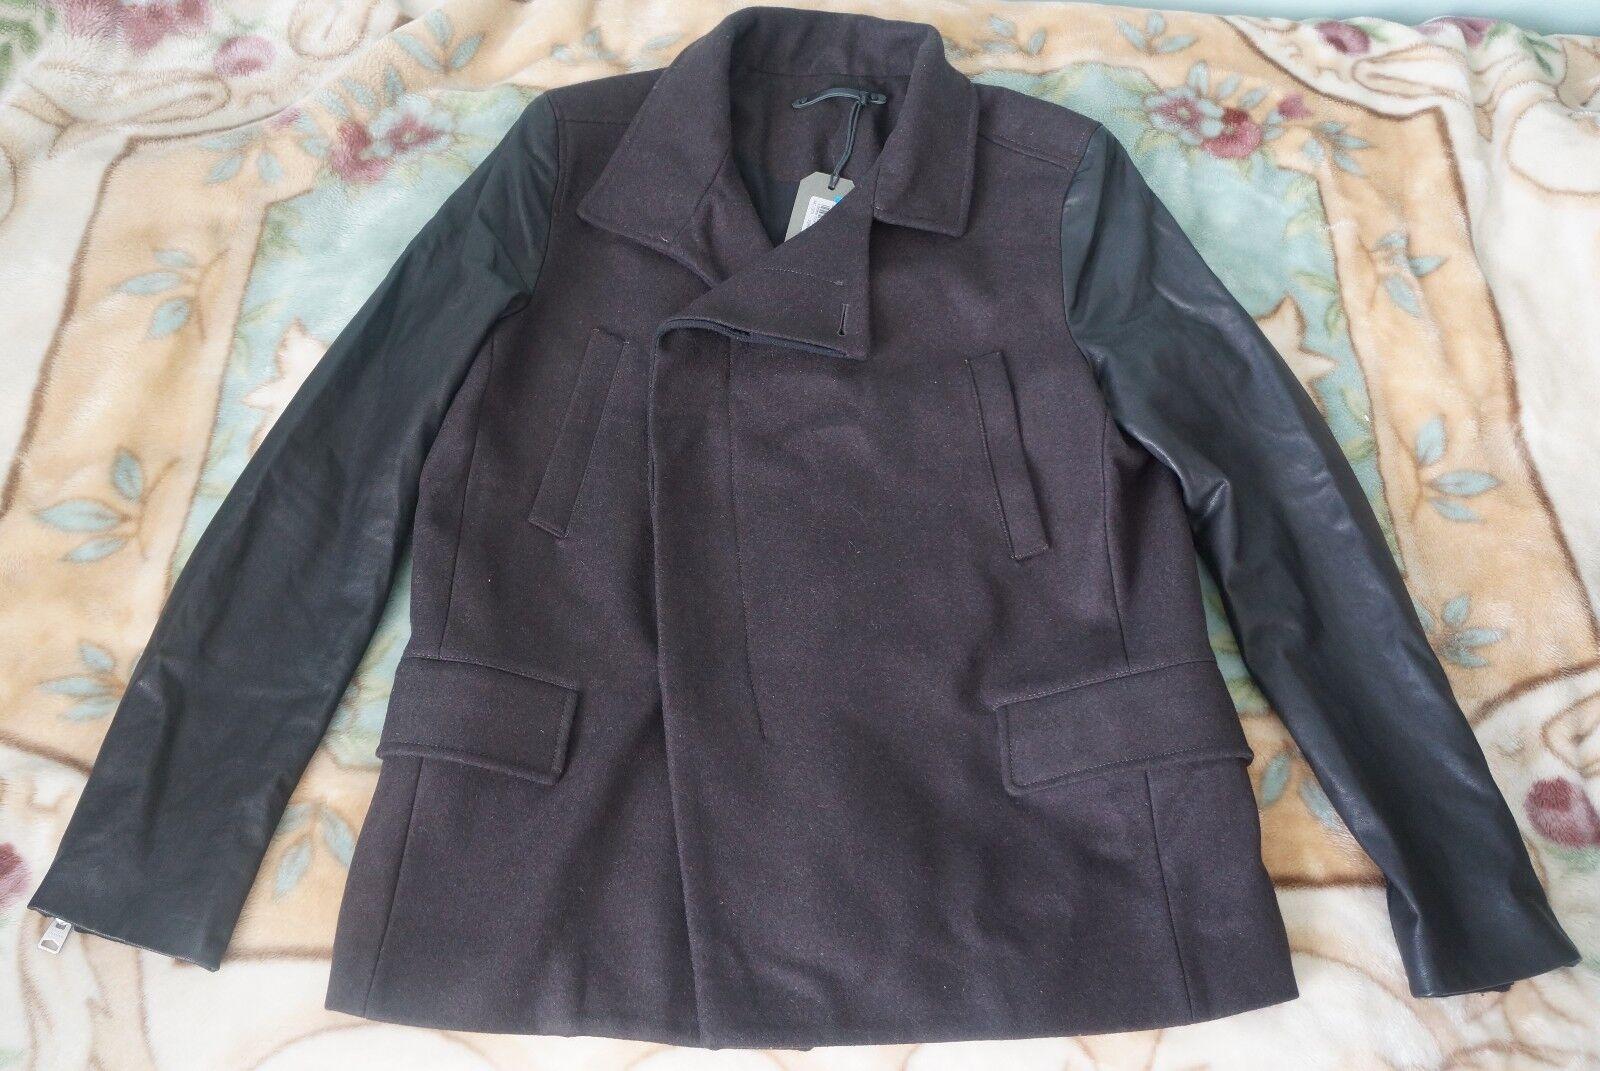 Brand New  Herren All Saints Major Pea Coat, Dark Braun, Leder Arms, SIze L